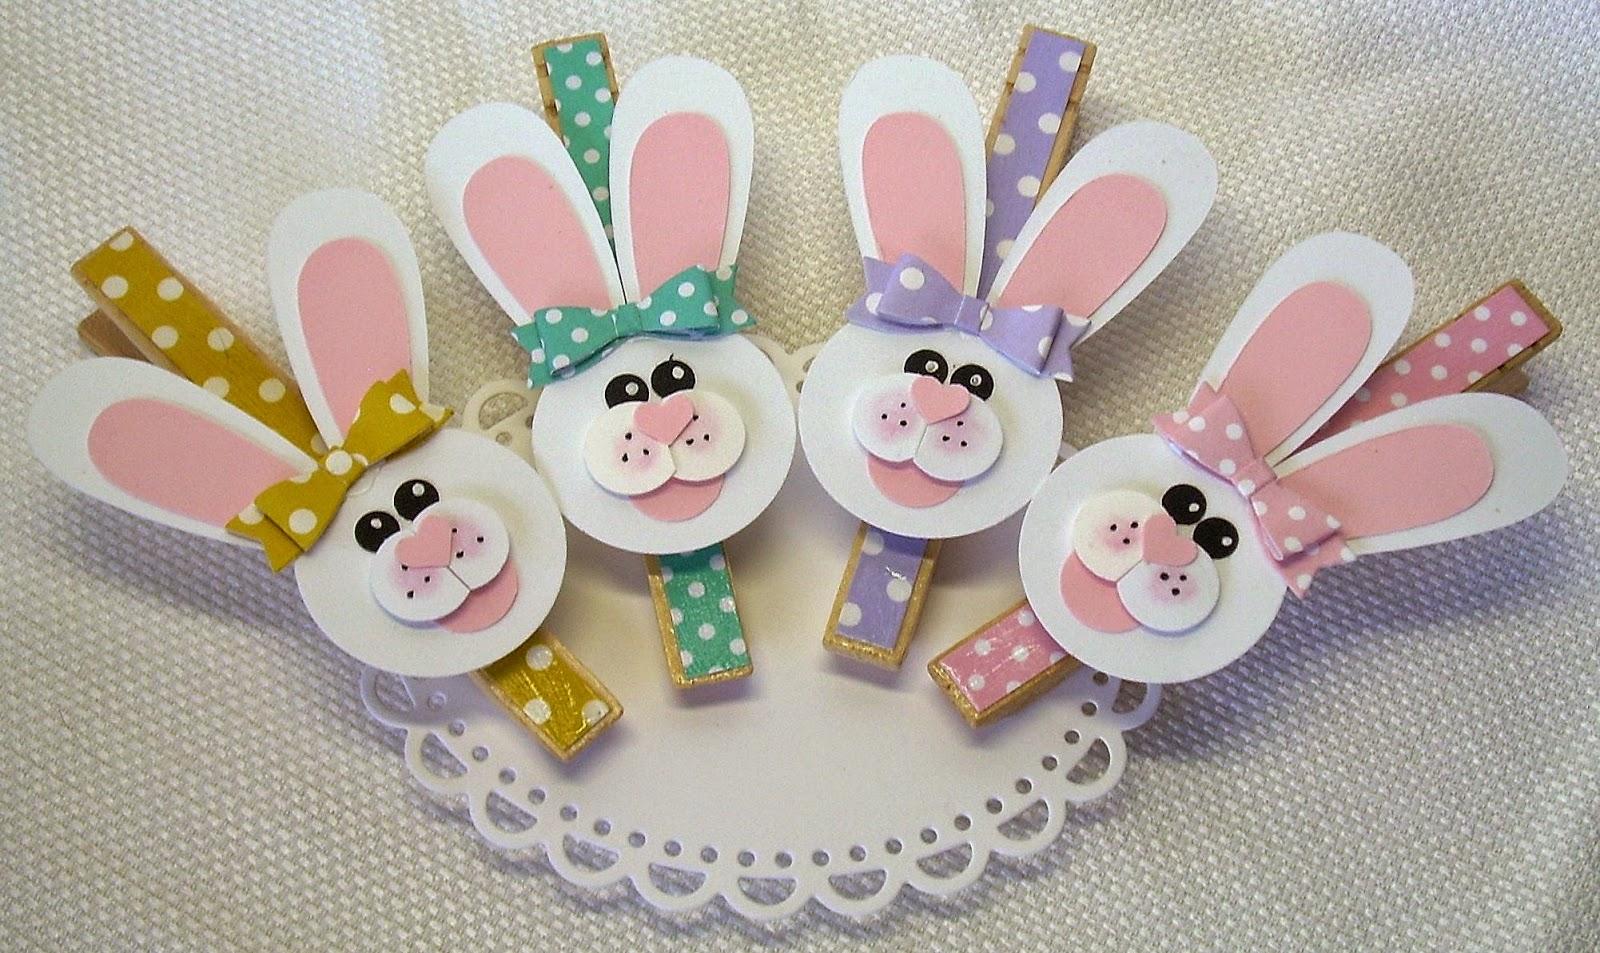 235a898d53f199 Beth-A-Palooza: Bunny Clothespins